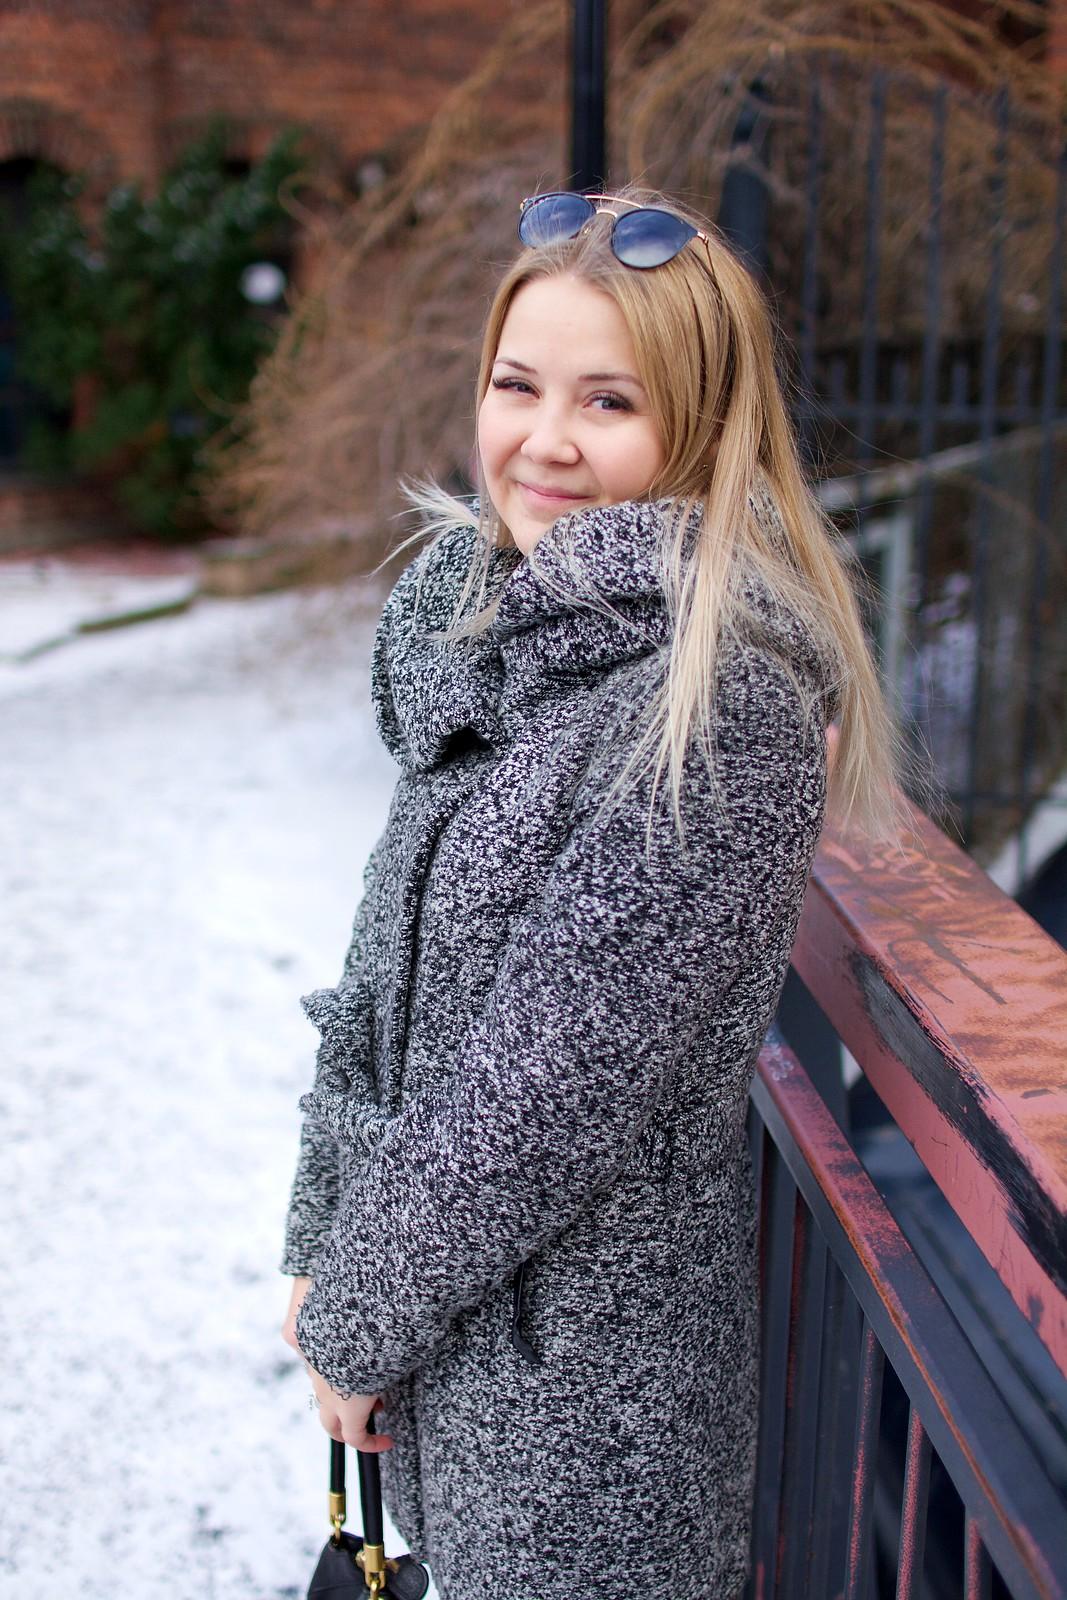 asu_keskusta_6